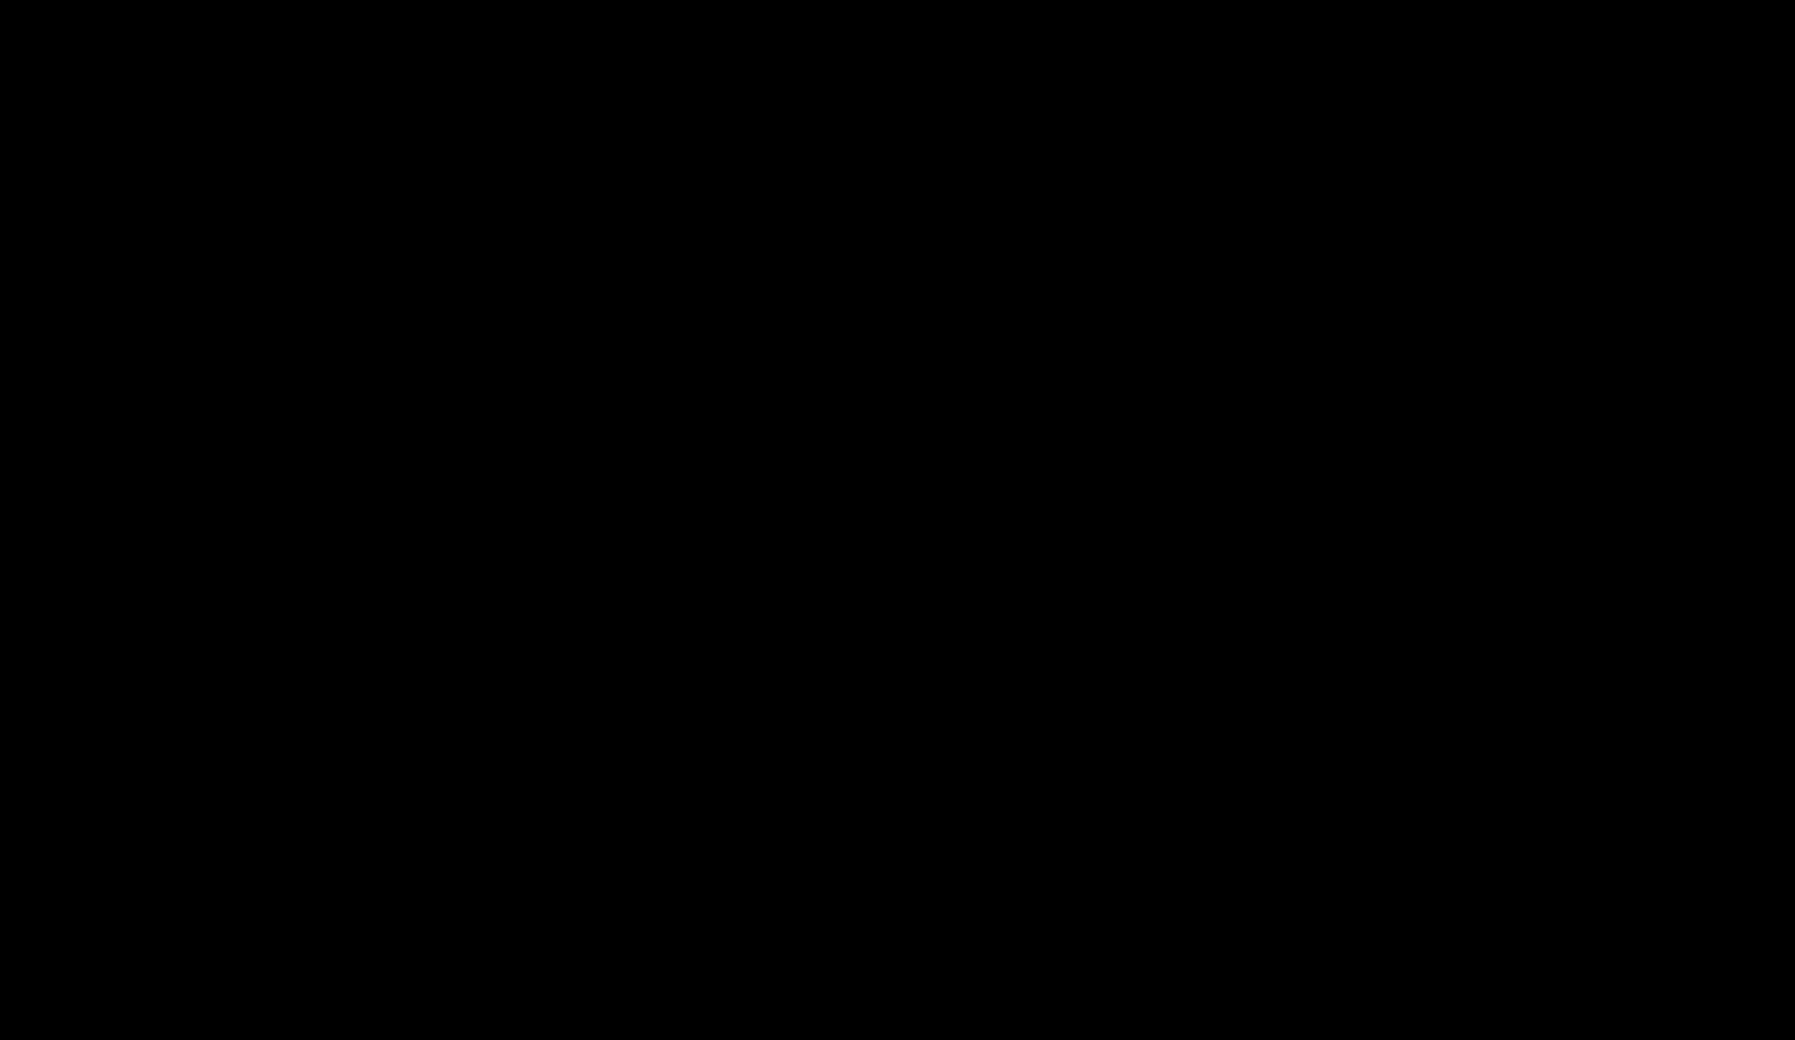 Bromoacetamido-dPEG®₁₂-Tris(-dPEG®₁₁-bromoacetamide)₃